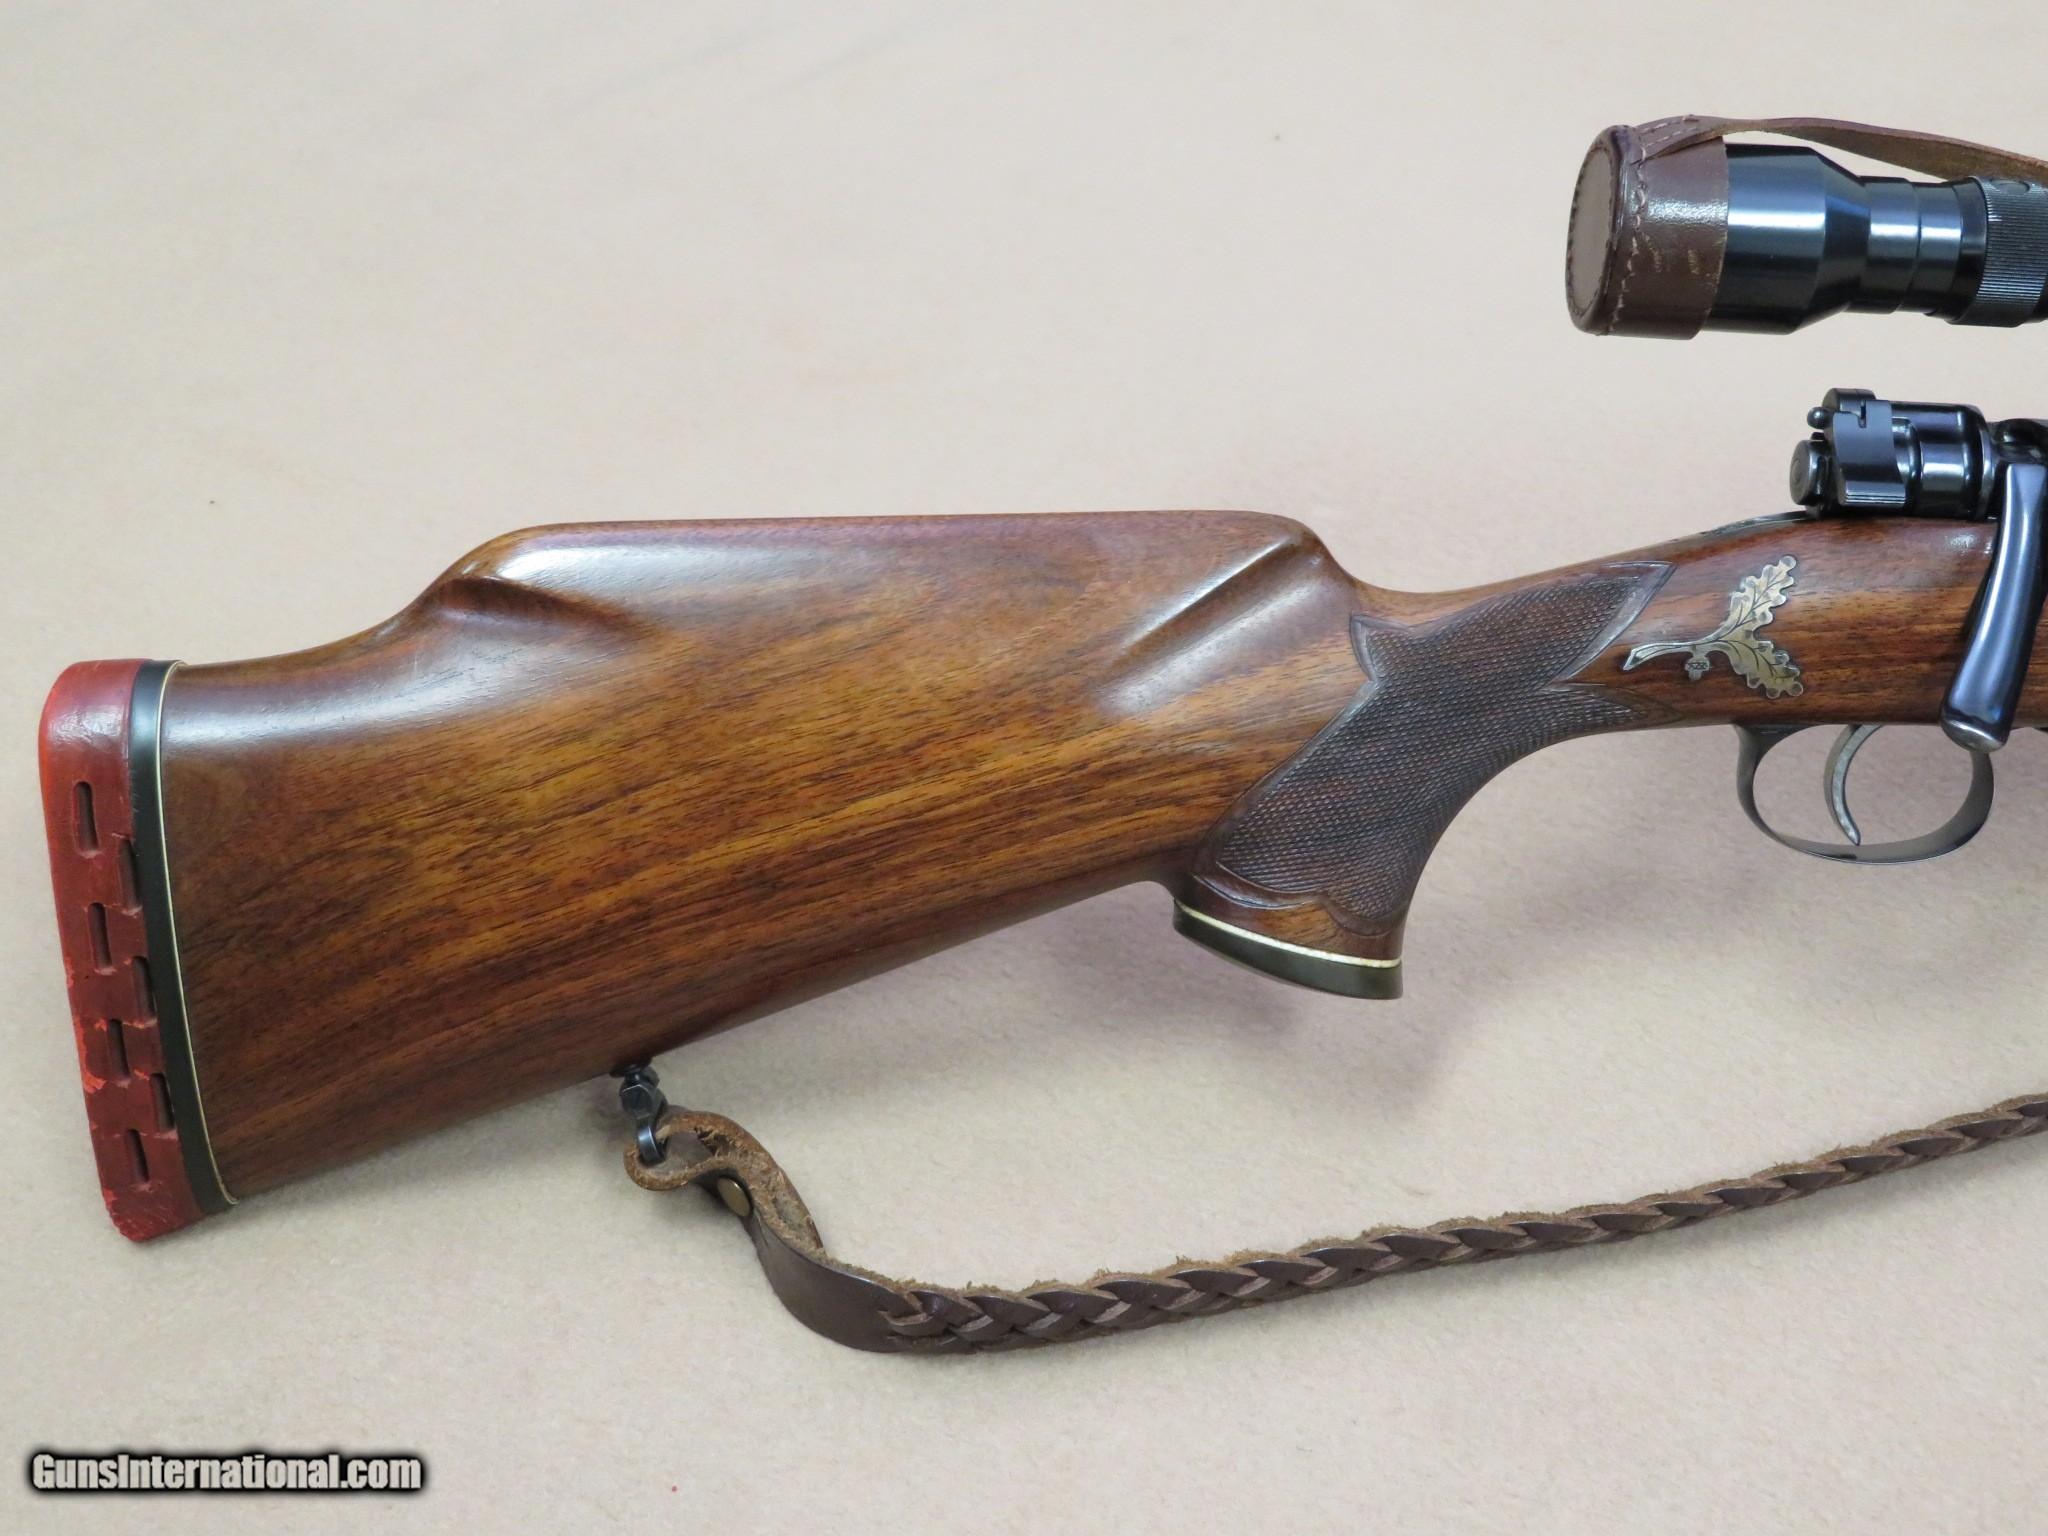 Spectacular Custom 98 Mauser Sporter w/ Hensoldt Dialytan 4X Scope